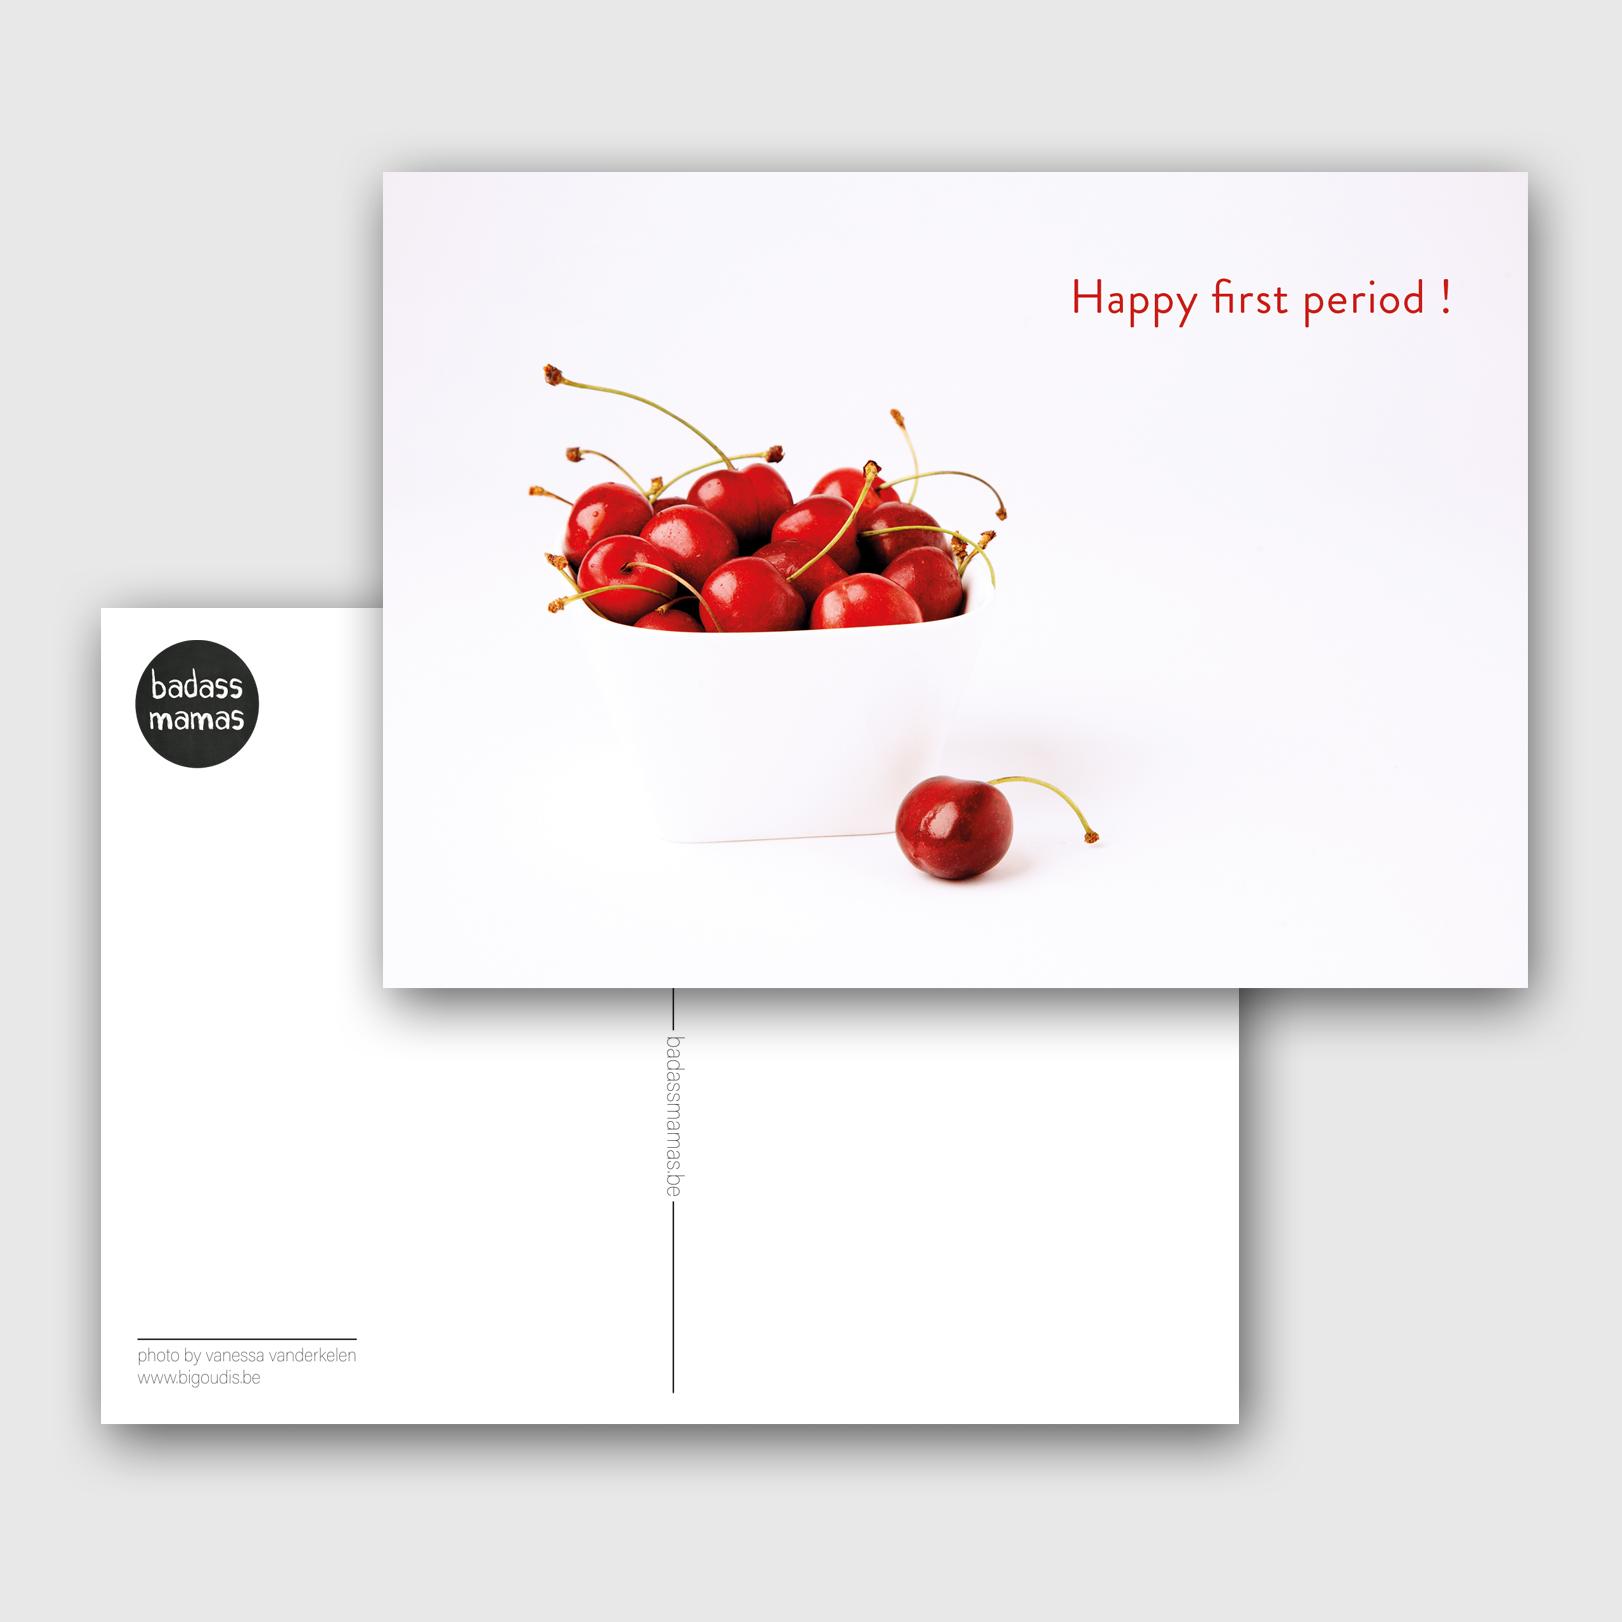 carte postale happy first period cherries